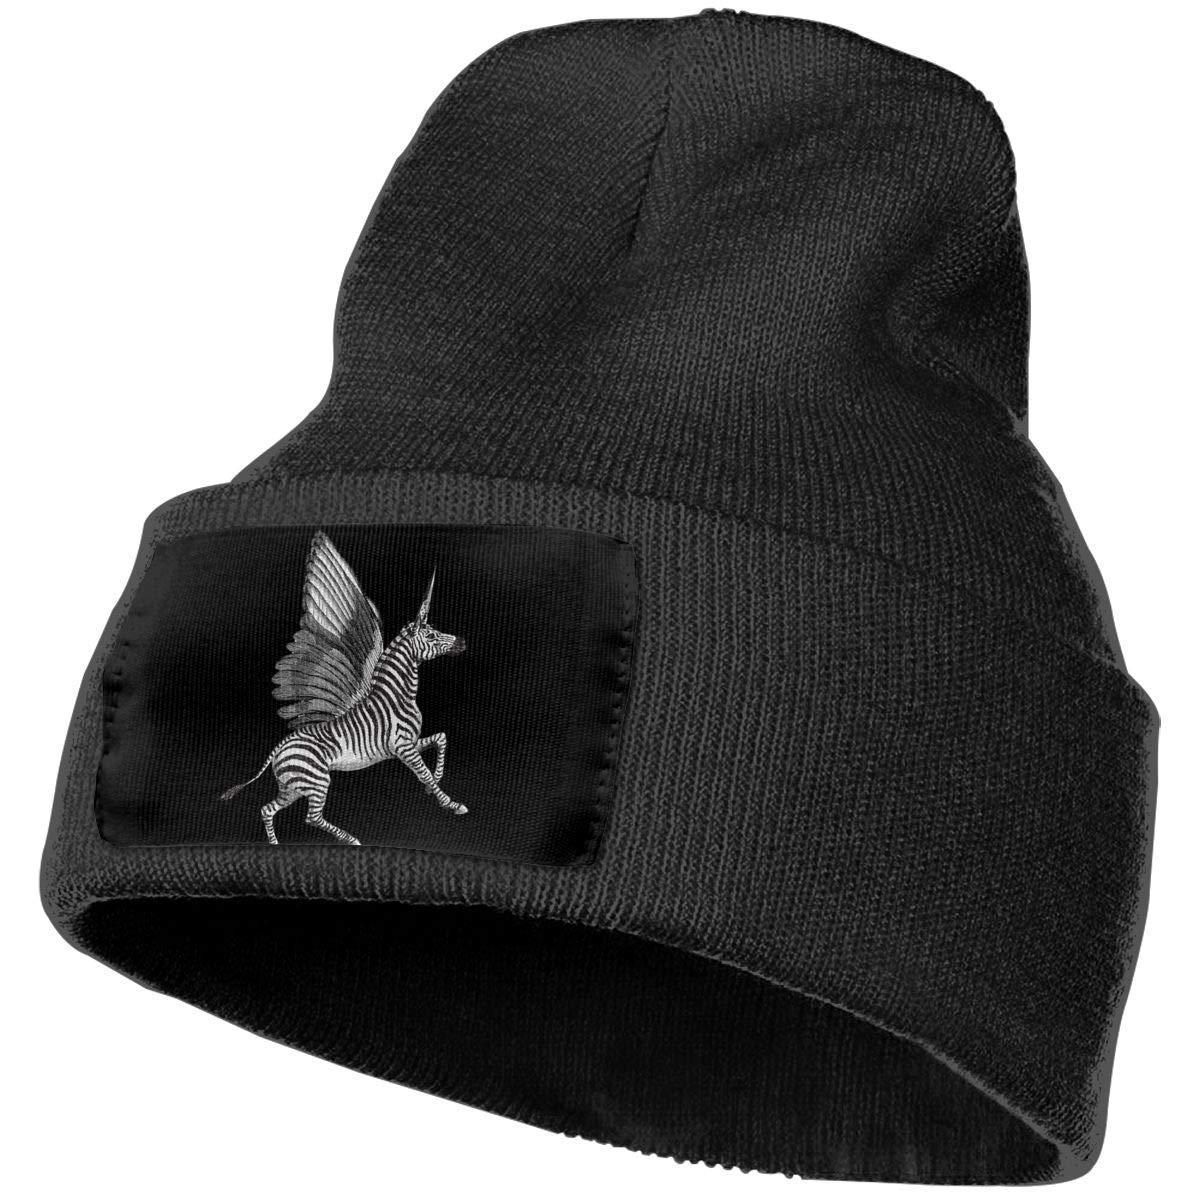 Zebra PEGACORN Men/&Women Warm Winter Knit Plain Beanie Hat Skull Cap Acrylic Knit Cuff Hat